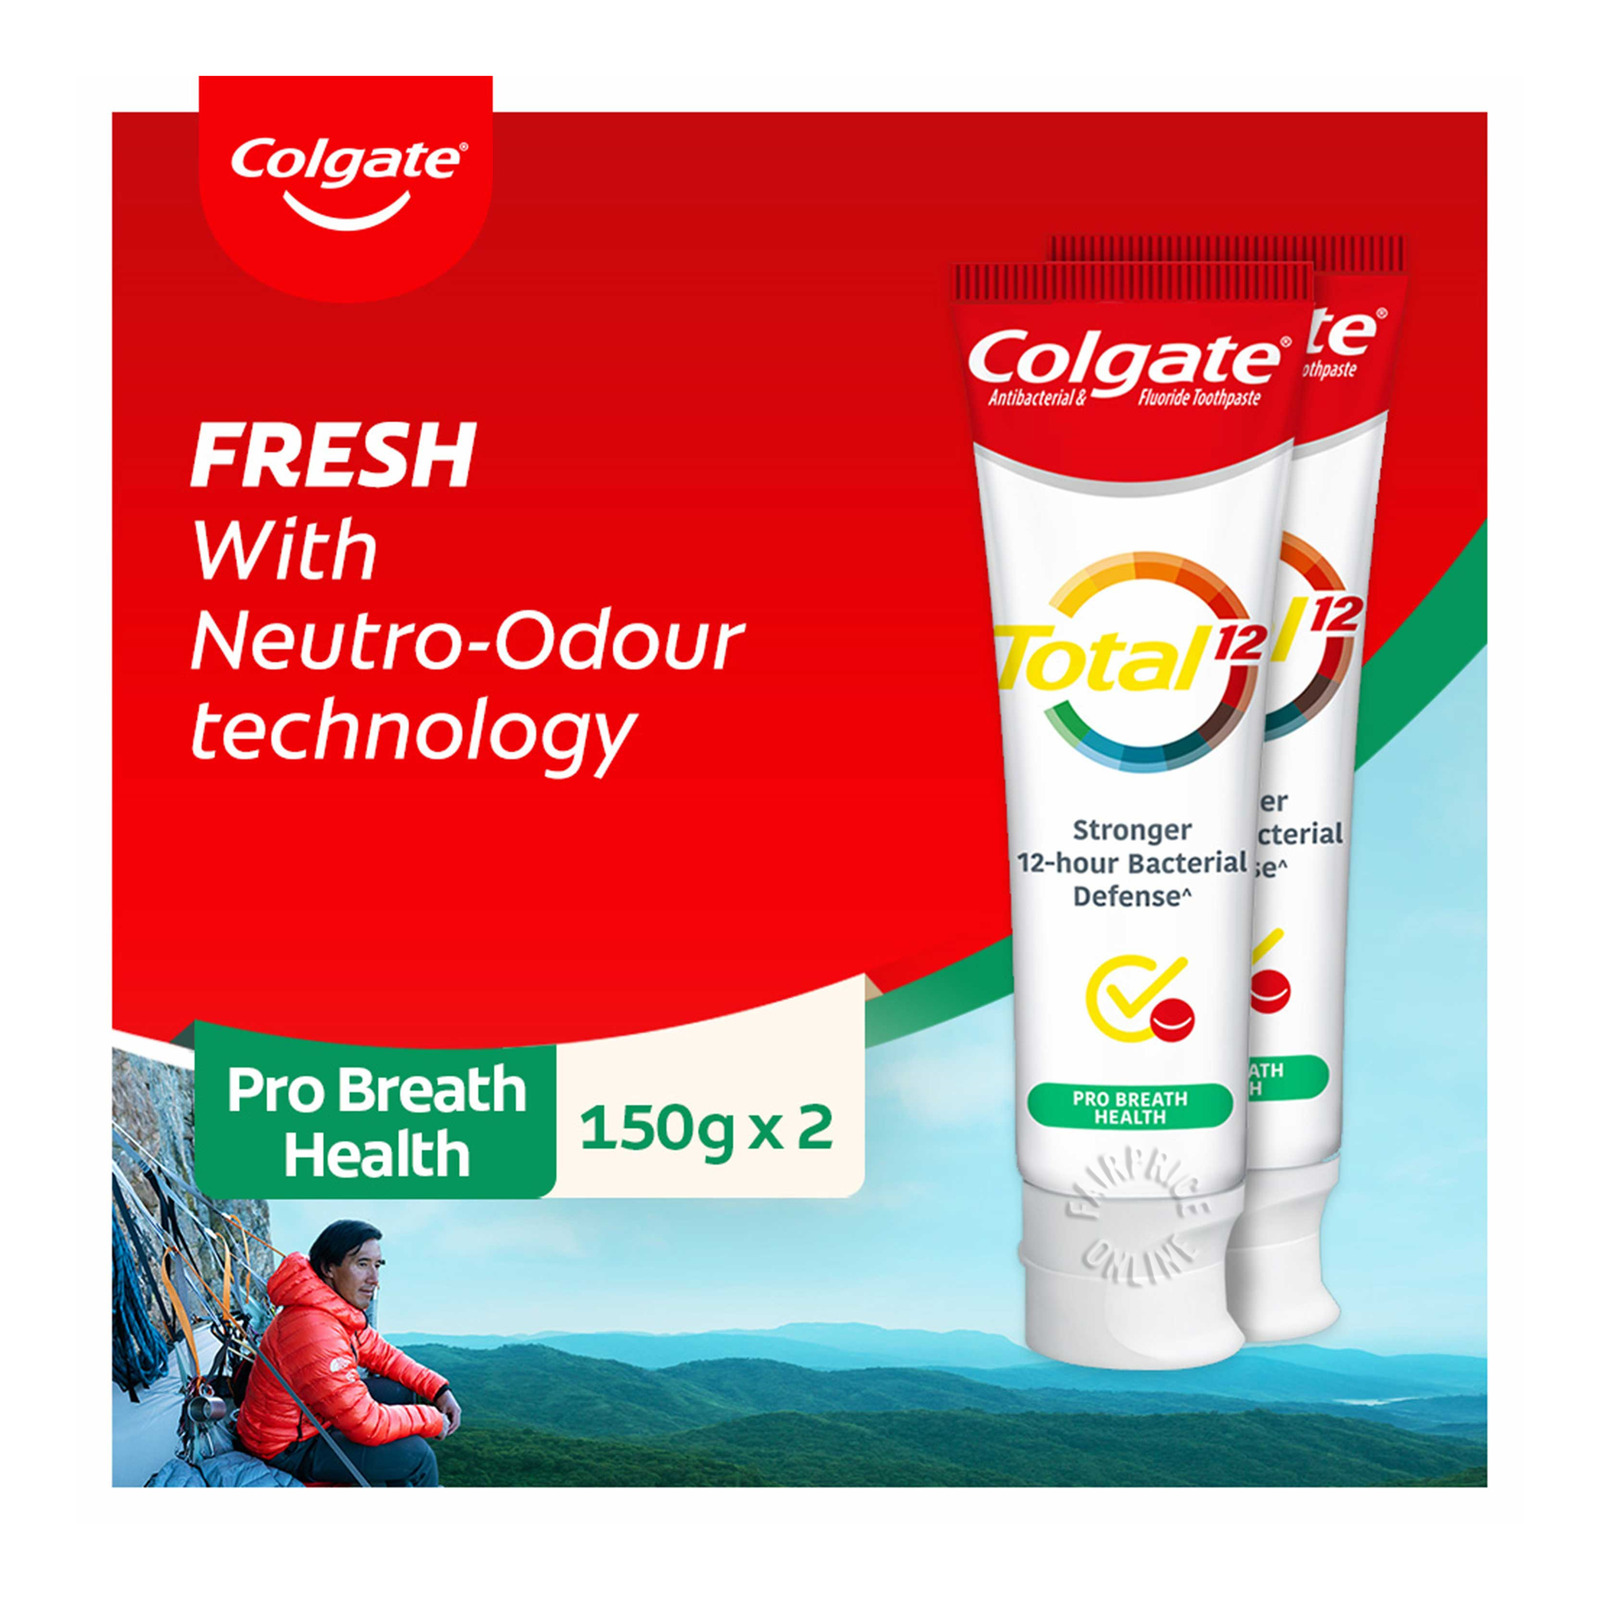 COLGATE colgate total professional breath health toothpaste 2x150g bundle pack